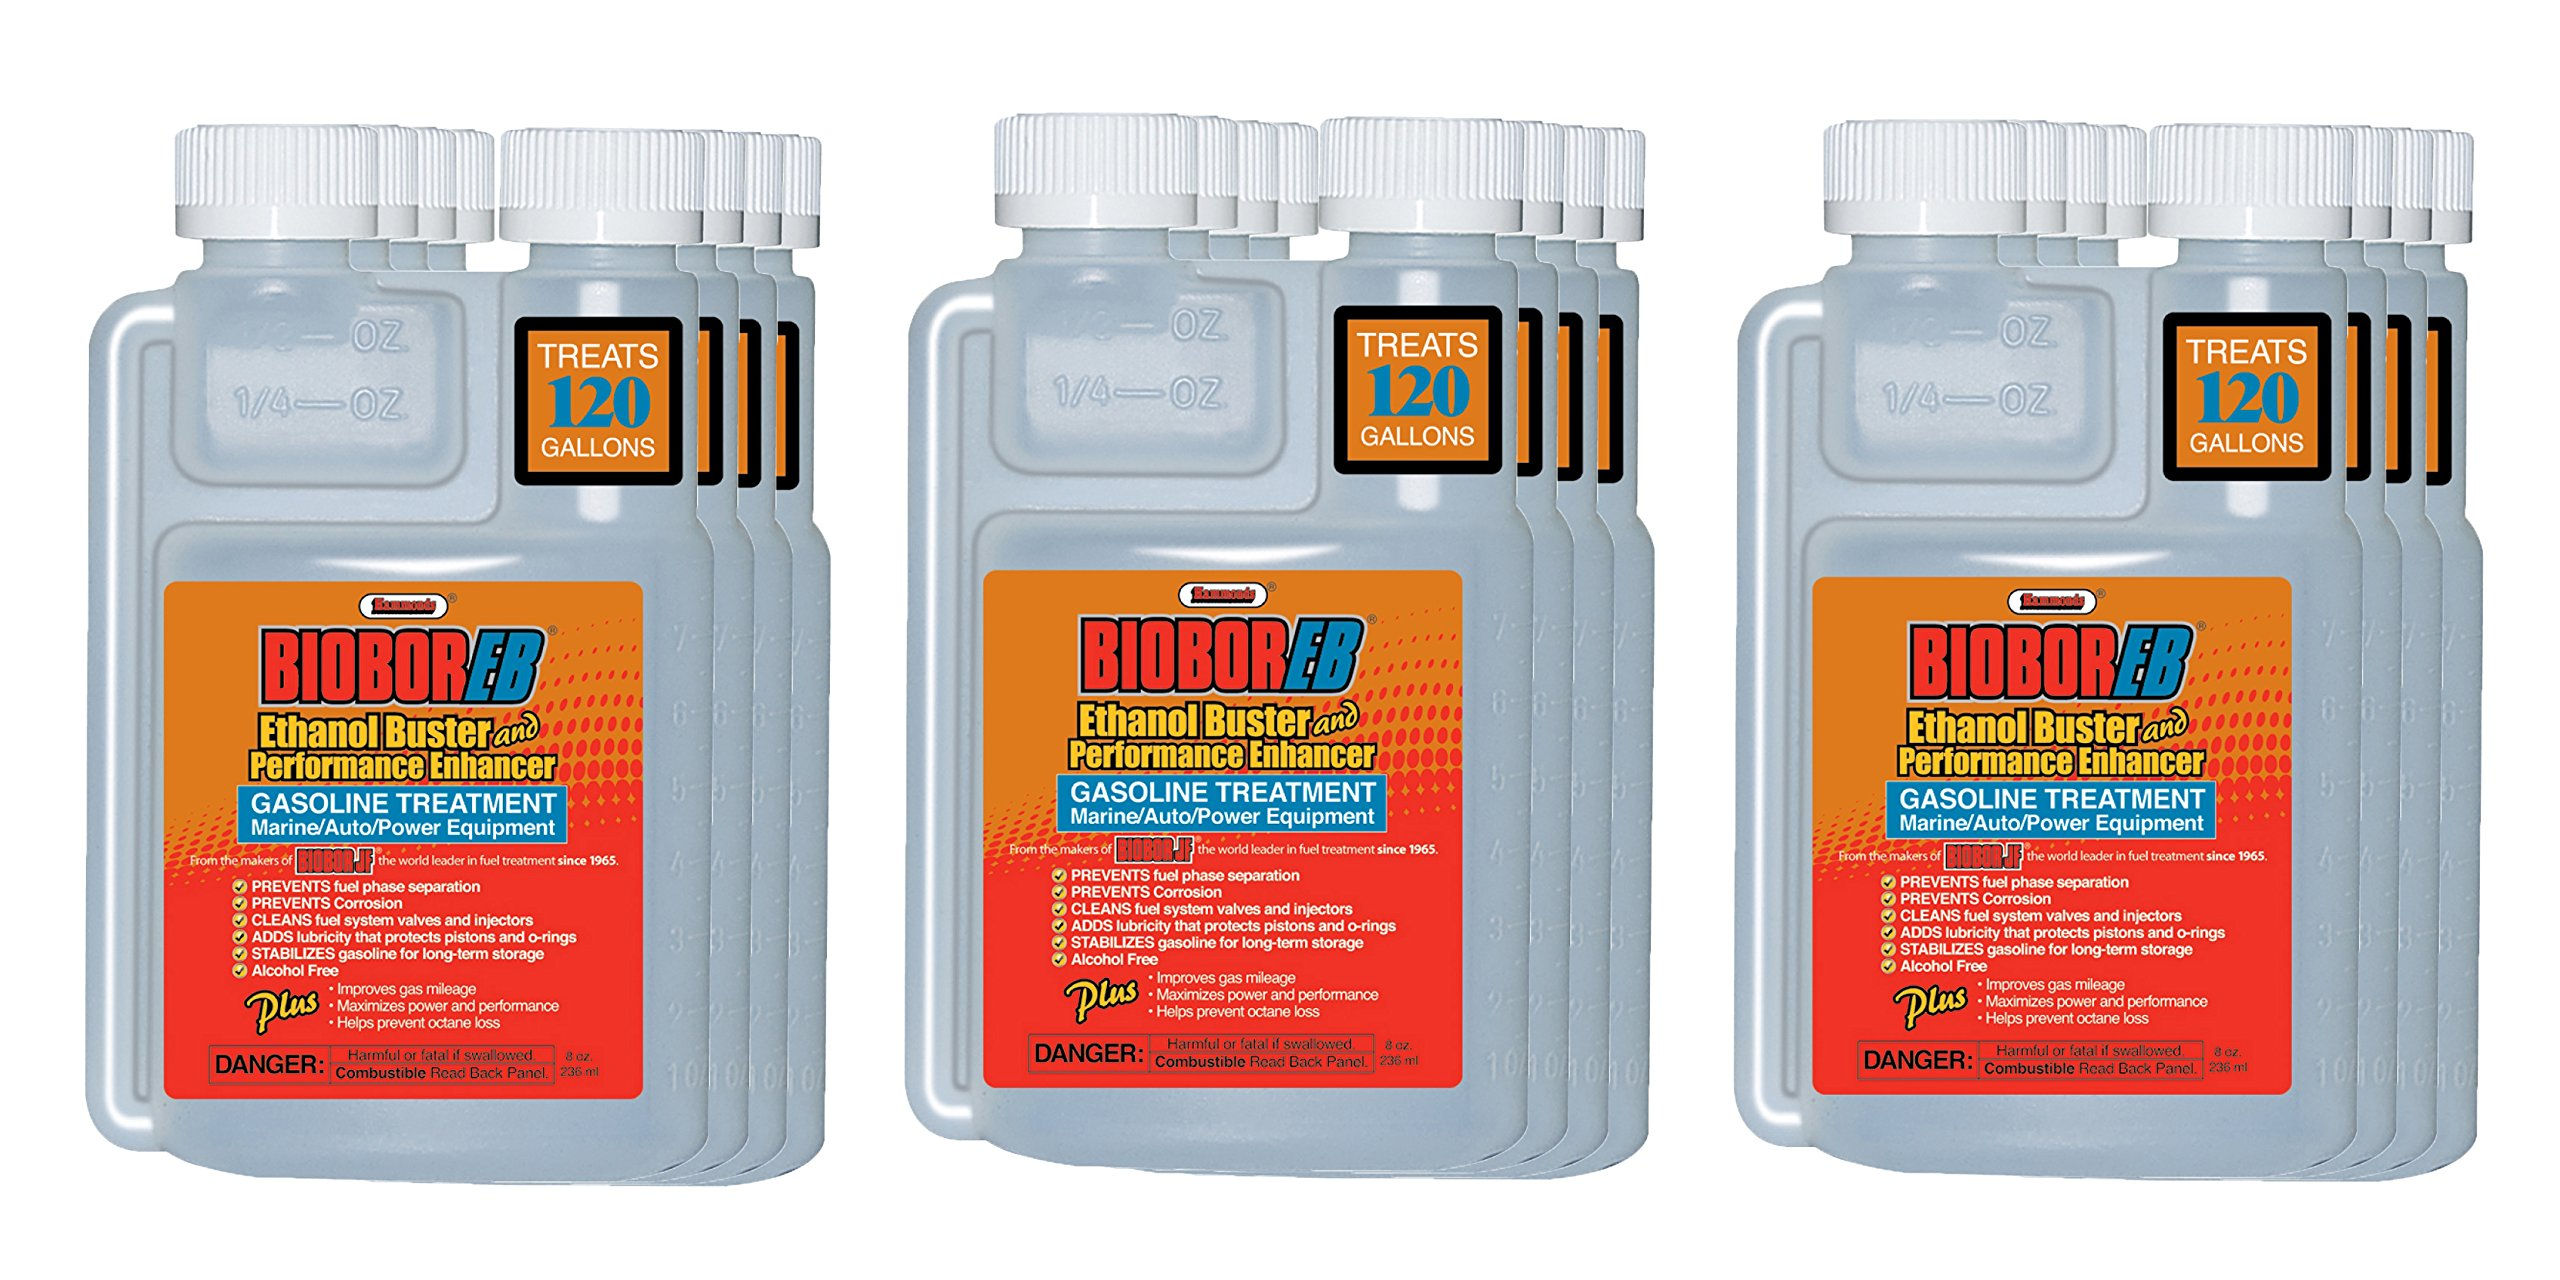 Biobor EB, Ethanol Buster and Performance Enhancer Gasoline Treatment, 8 oz, 12-Pack